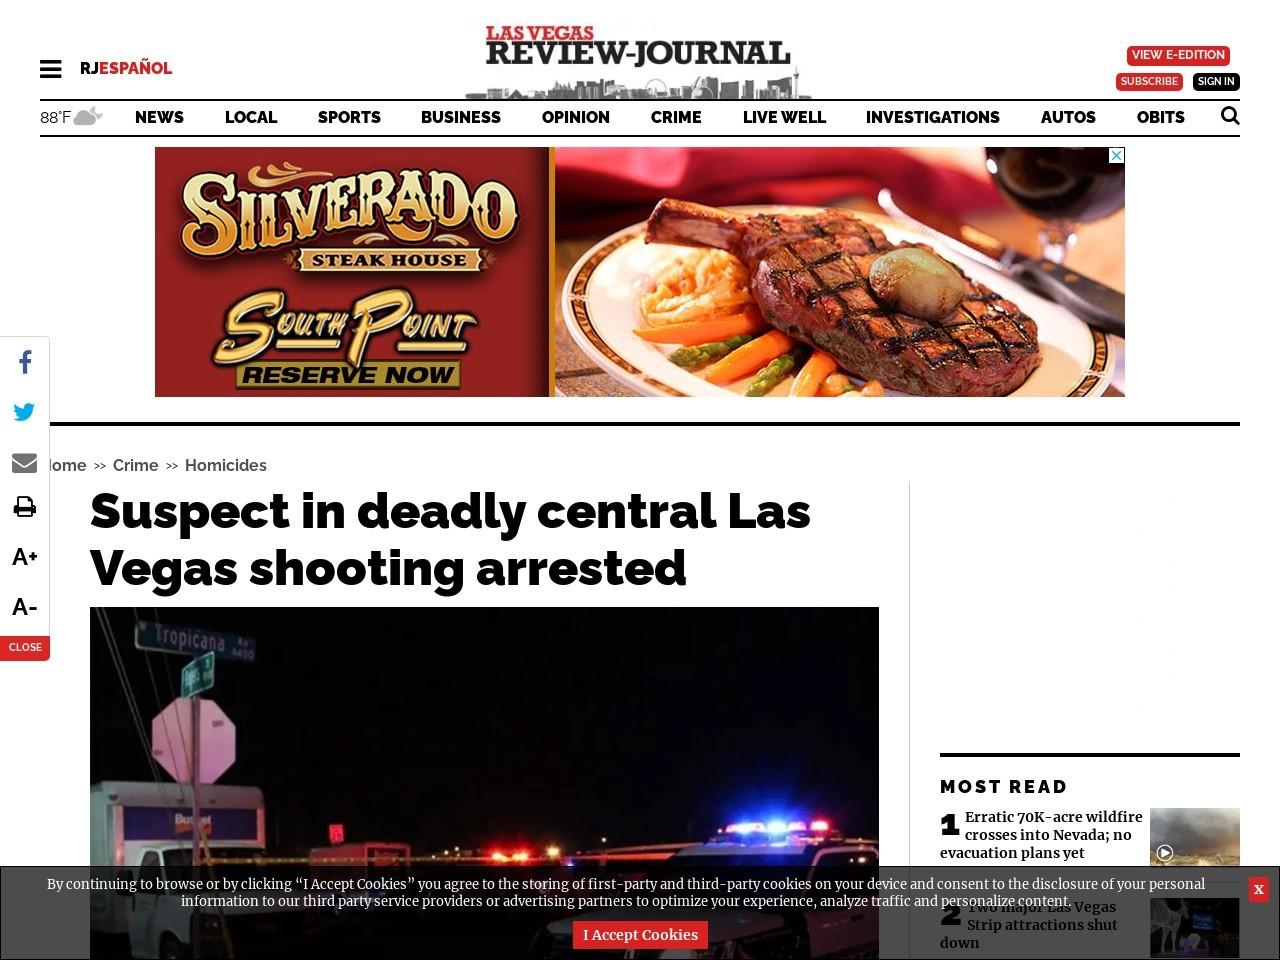 Suspect in deadly central Las Vegas shooting in custody